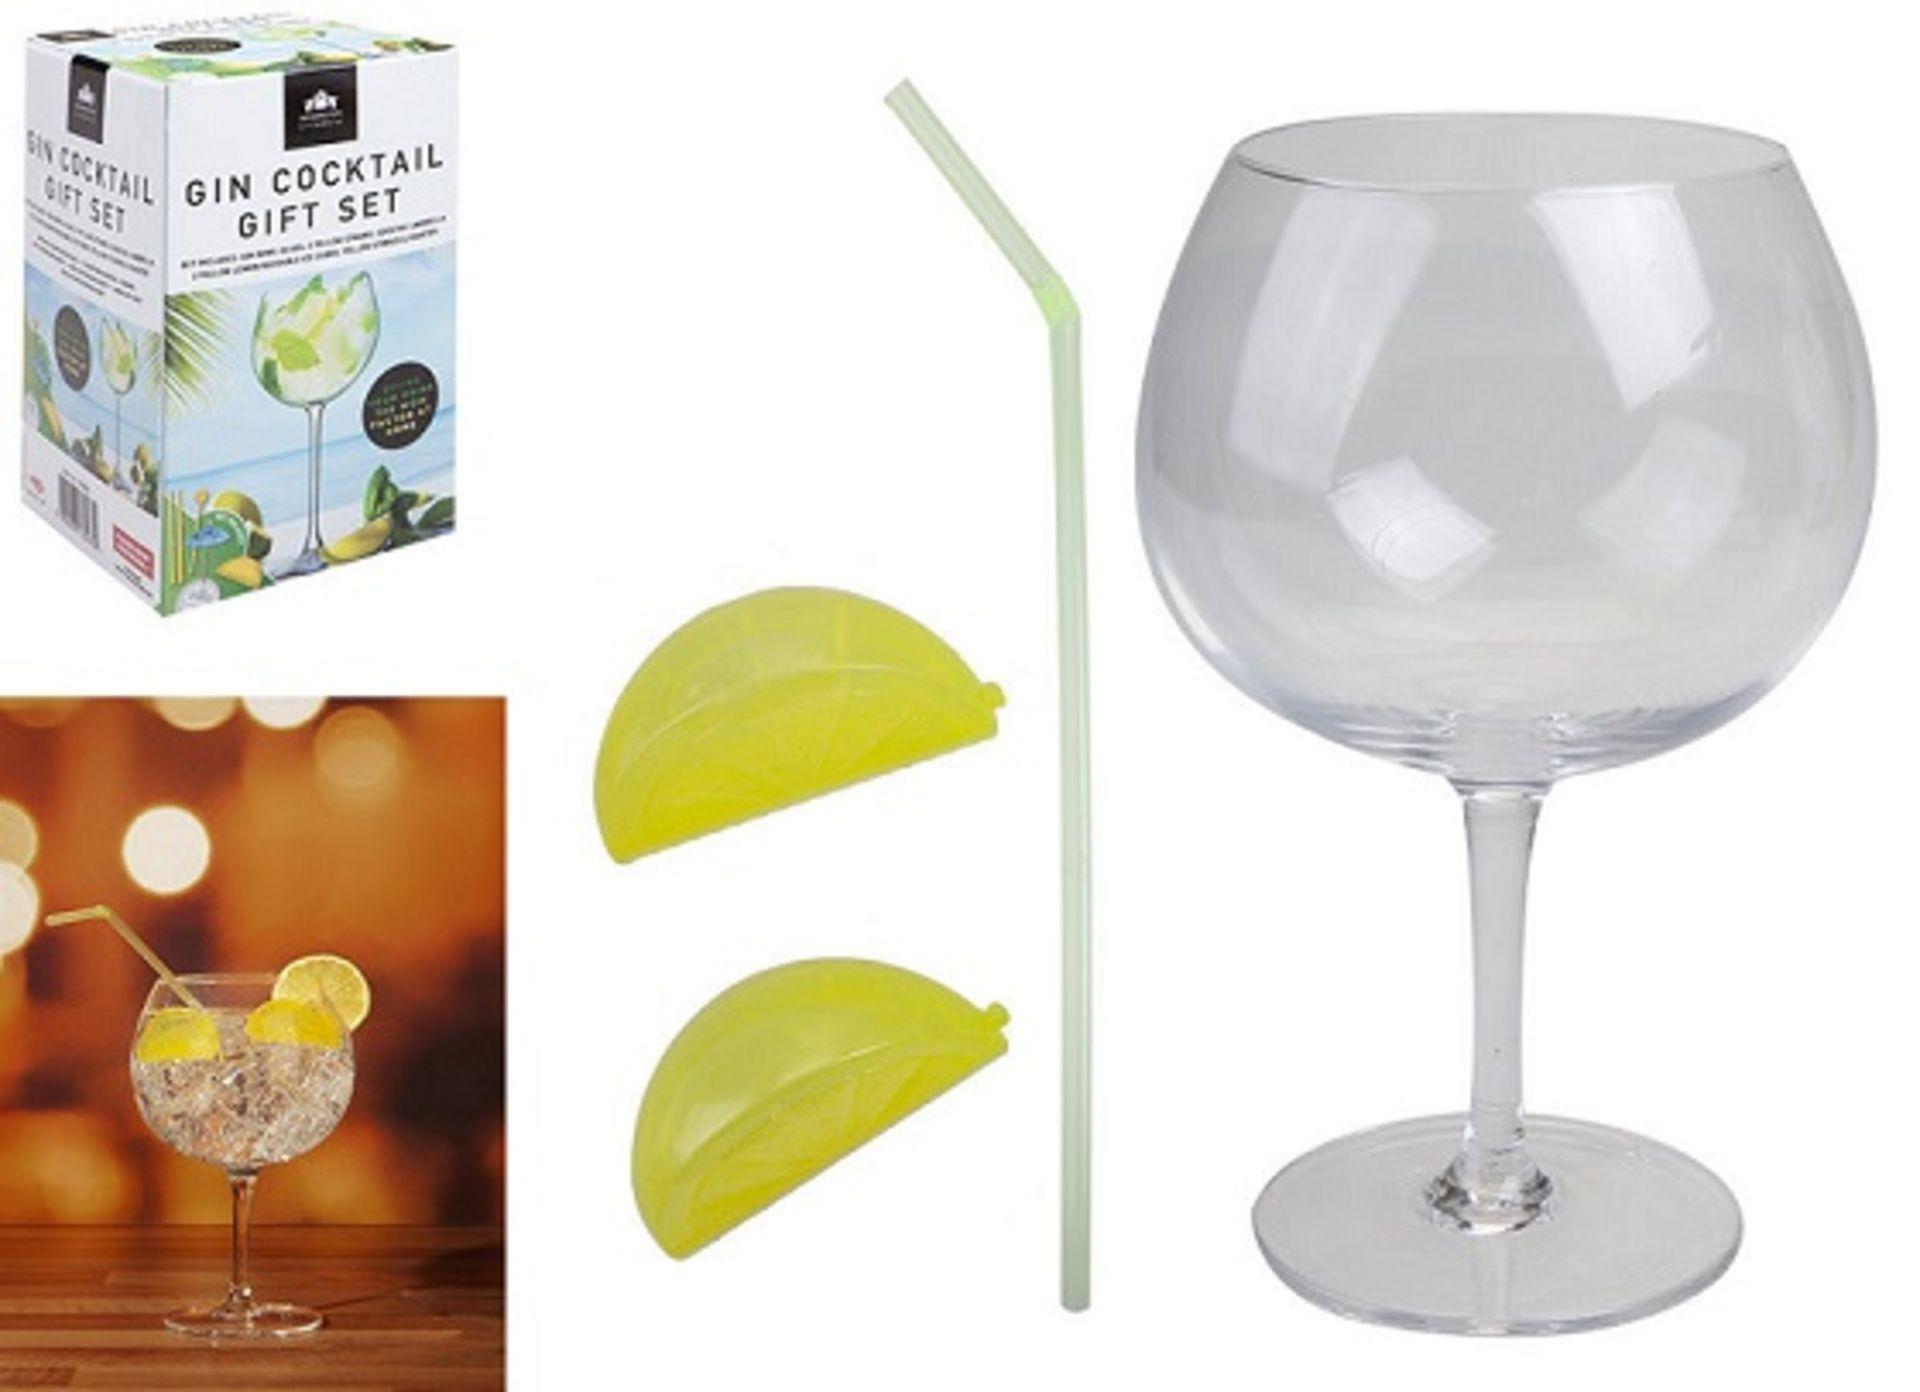 Lot 50107 - V Brand New Kensington Gin Cocktail Gift Set Includes Gin Bowl Glass-Straw-Two Lemon Reusable Ice